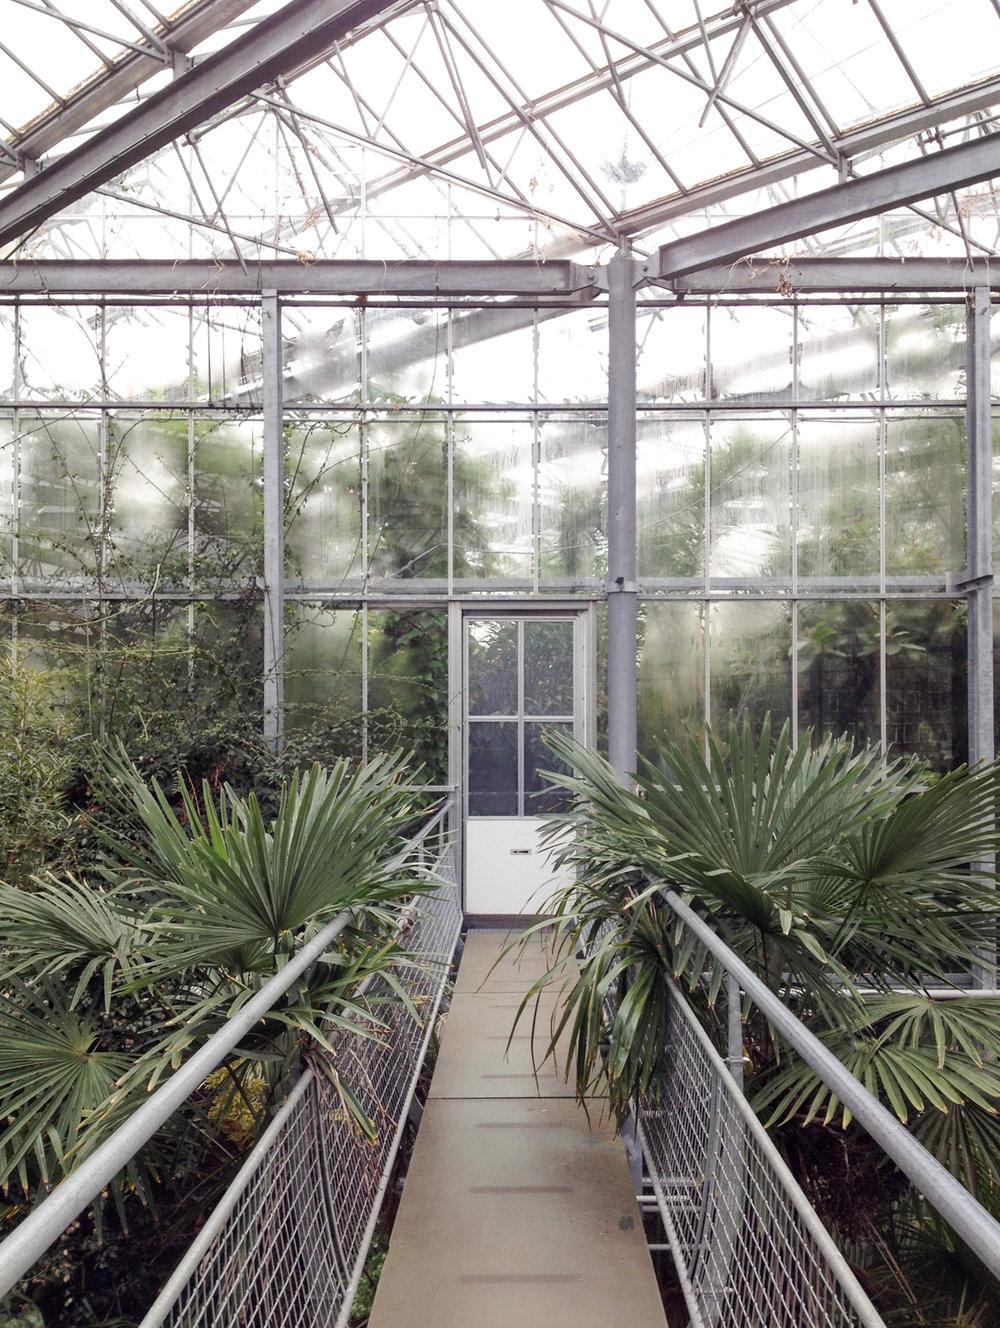 hortus-amsterdam-inspire-styling-1-of-1-2.jpg